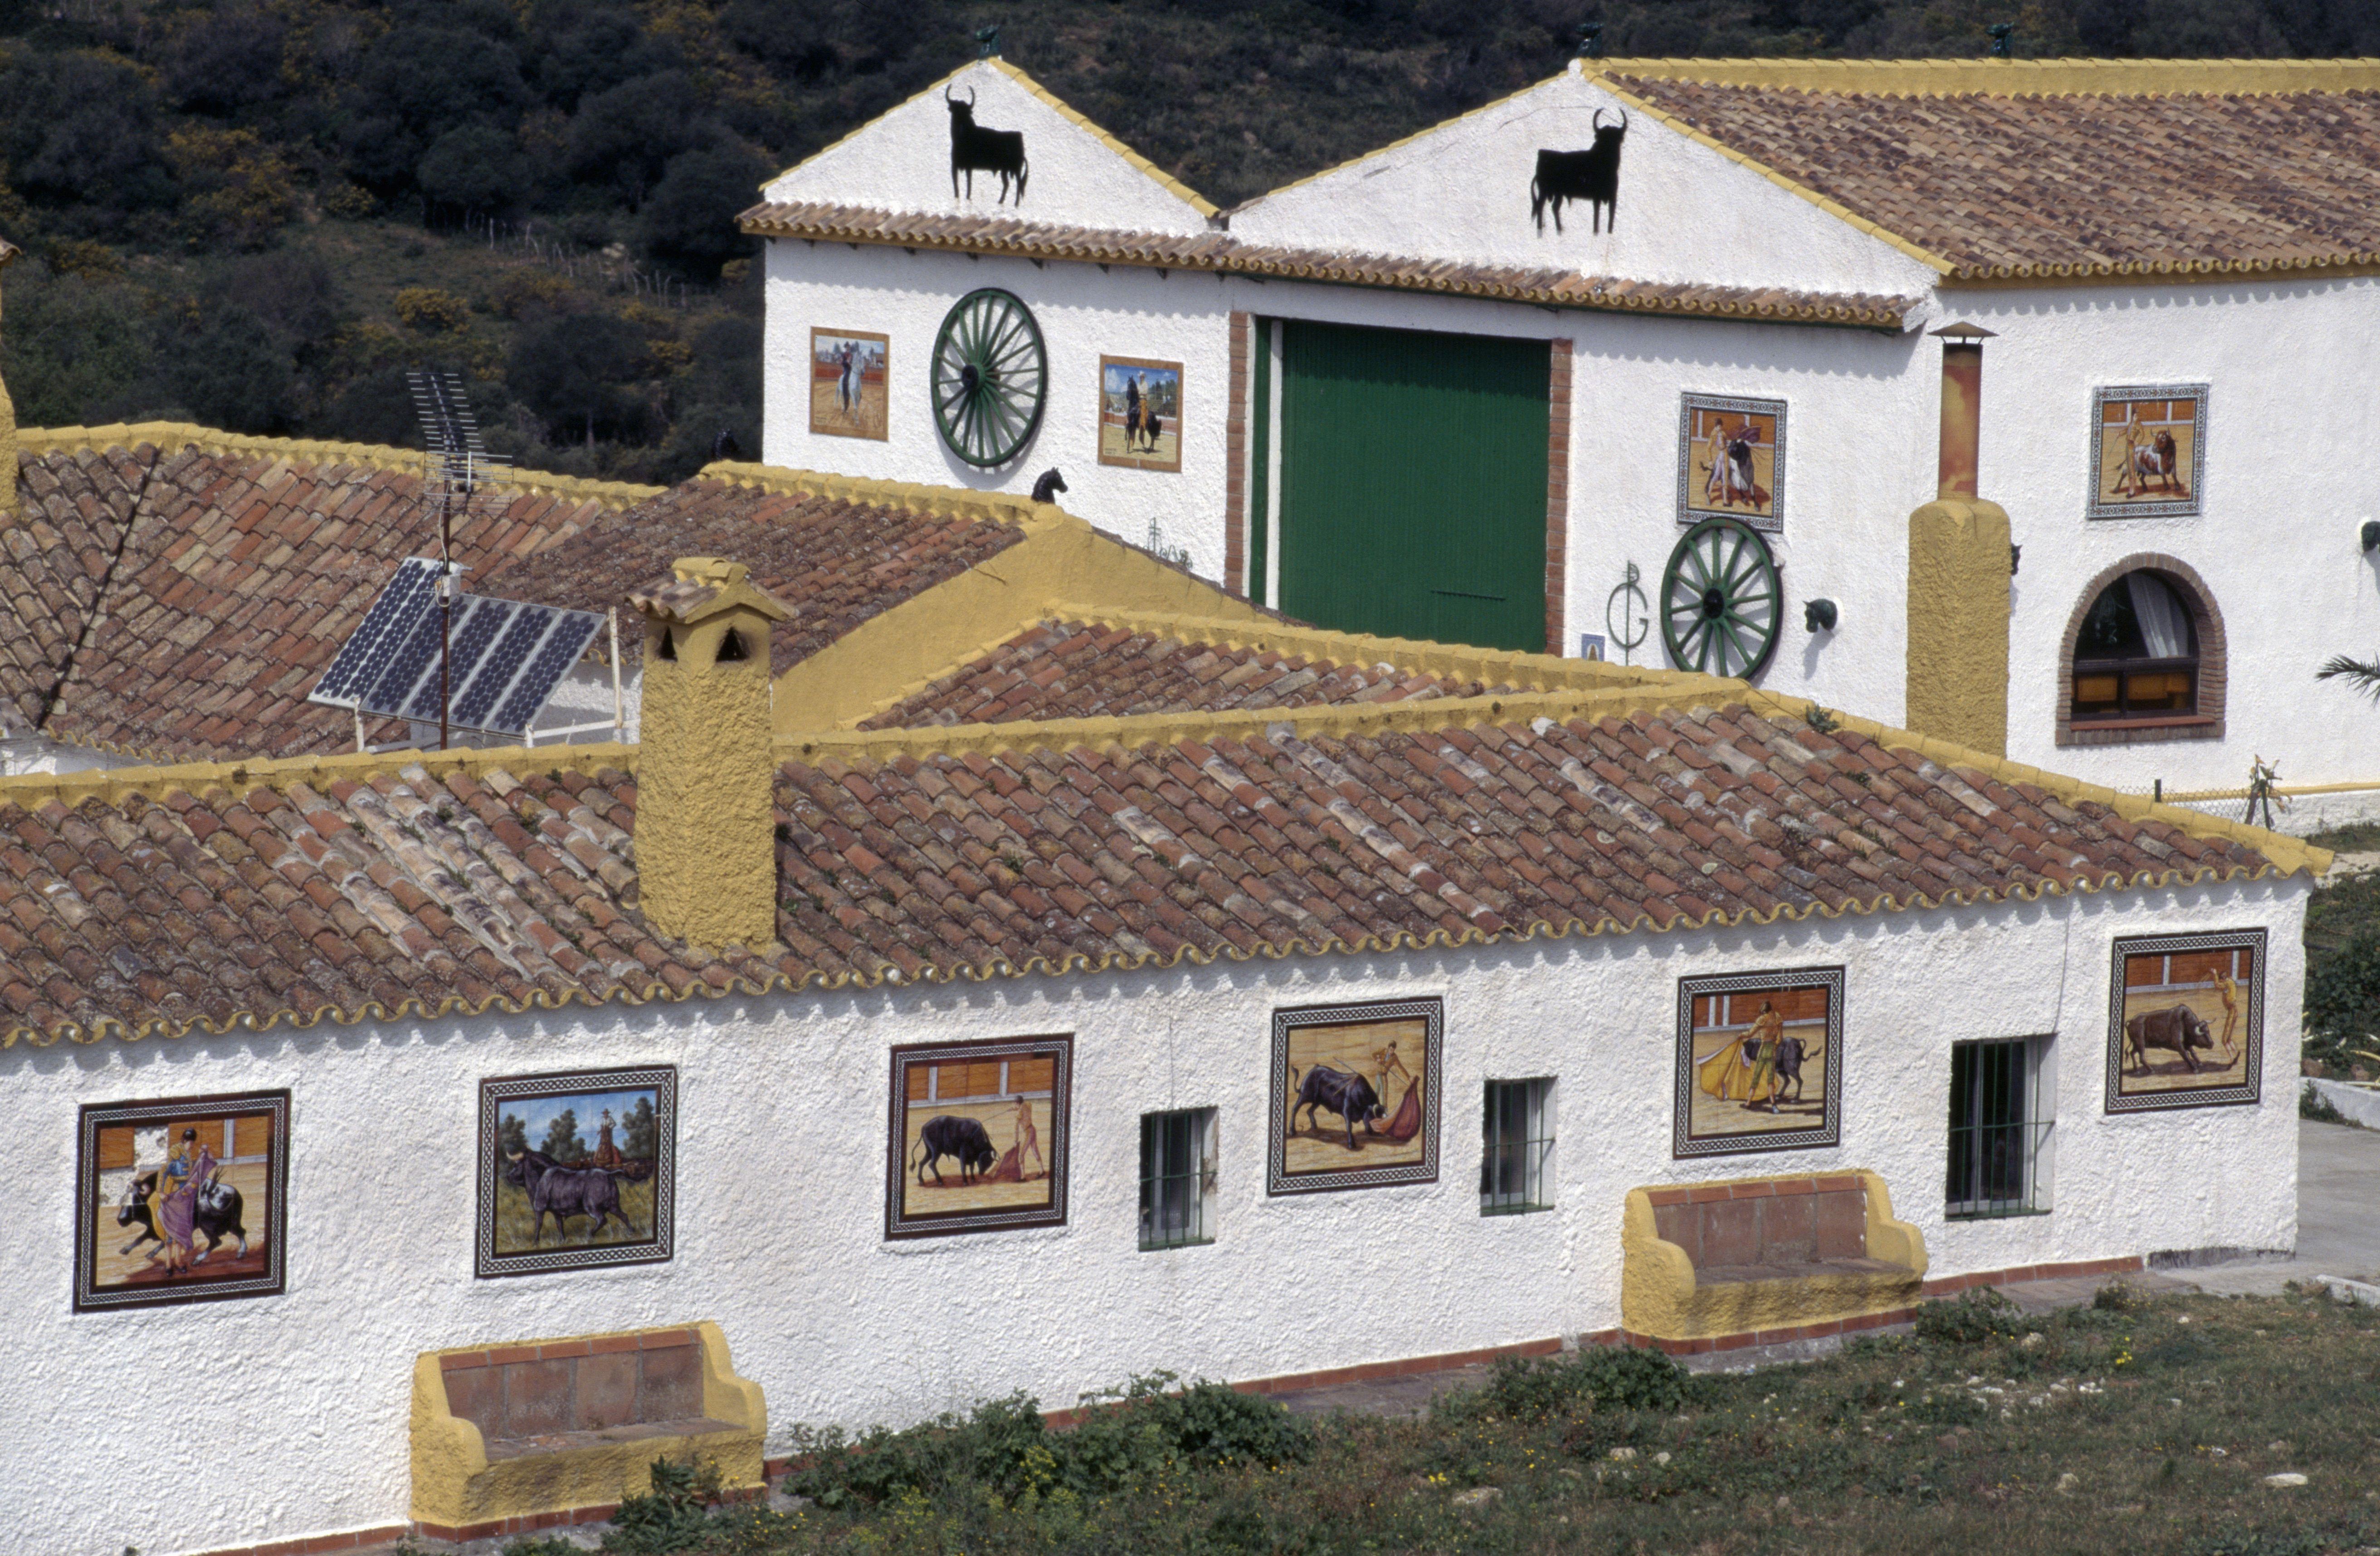 Bull farm near Algeciras, Andalusia, Spain